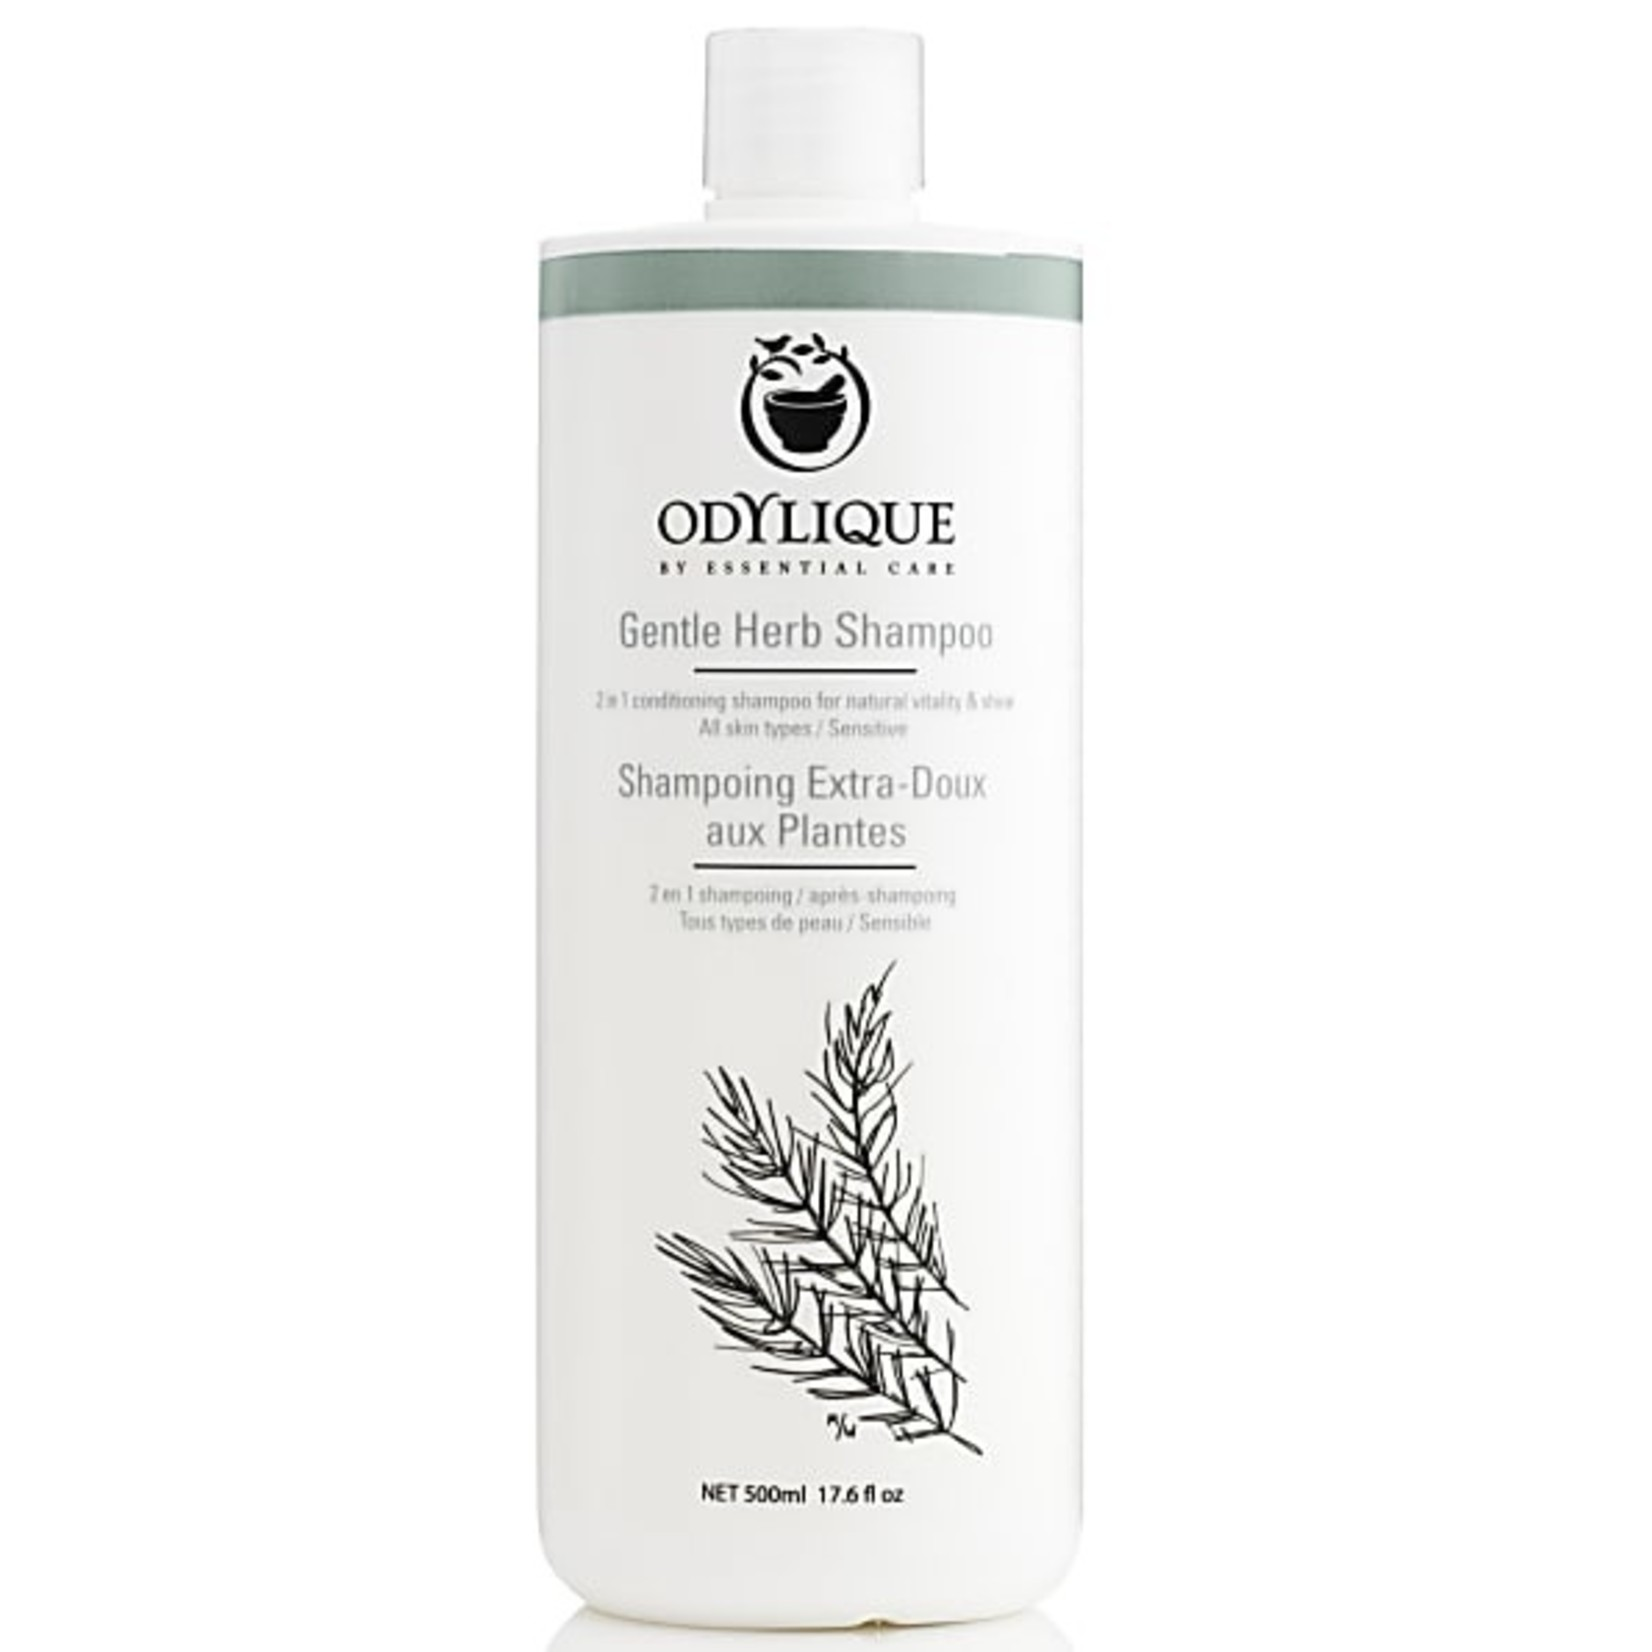 Odylique Gentle herb shampoo familieformaat 500ml Odylique